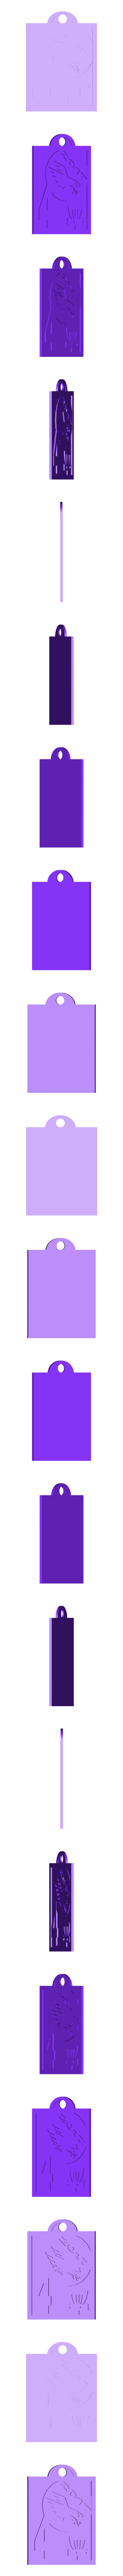 Disc_Bag_Tag_4.stl Download free STL file Disc Golf Bag Tag • 3D print design, mrhers2